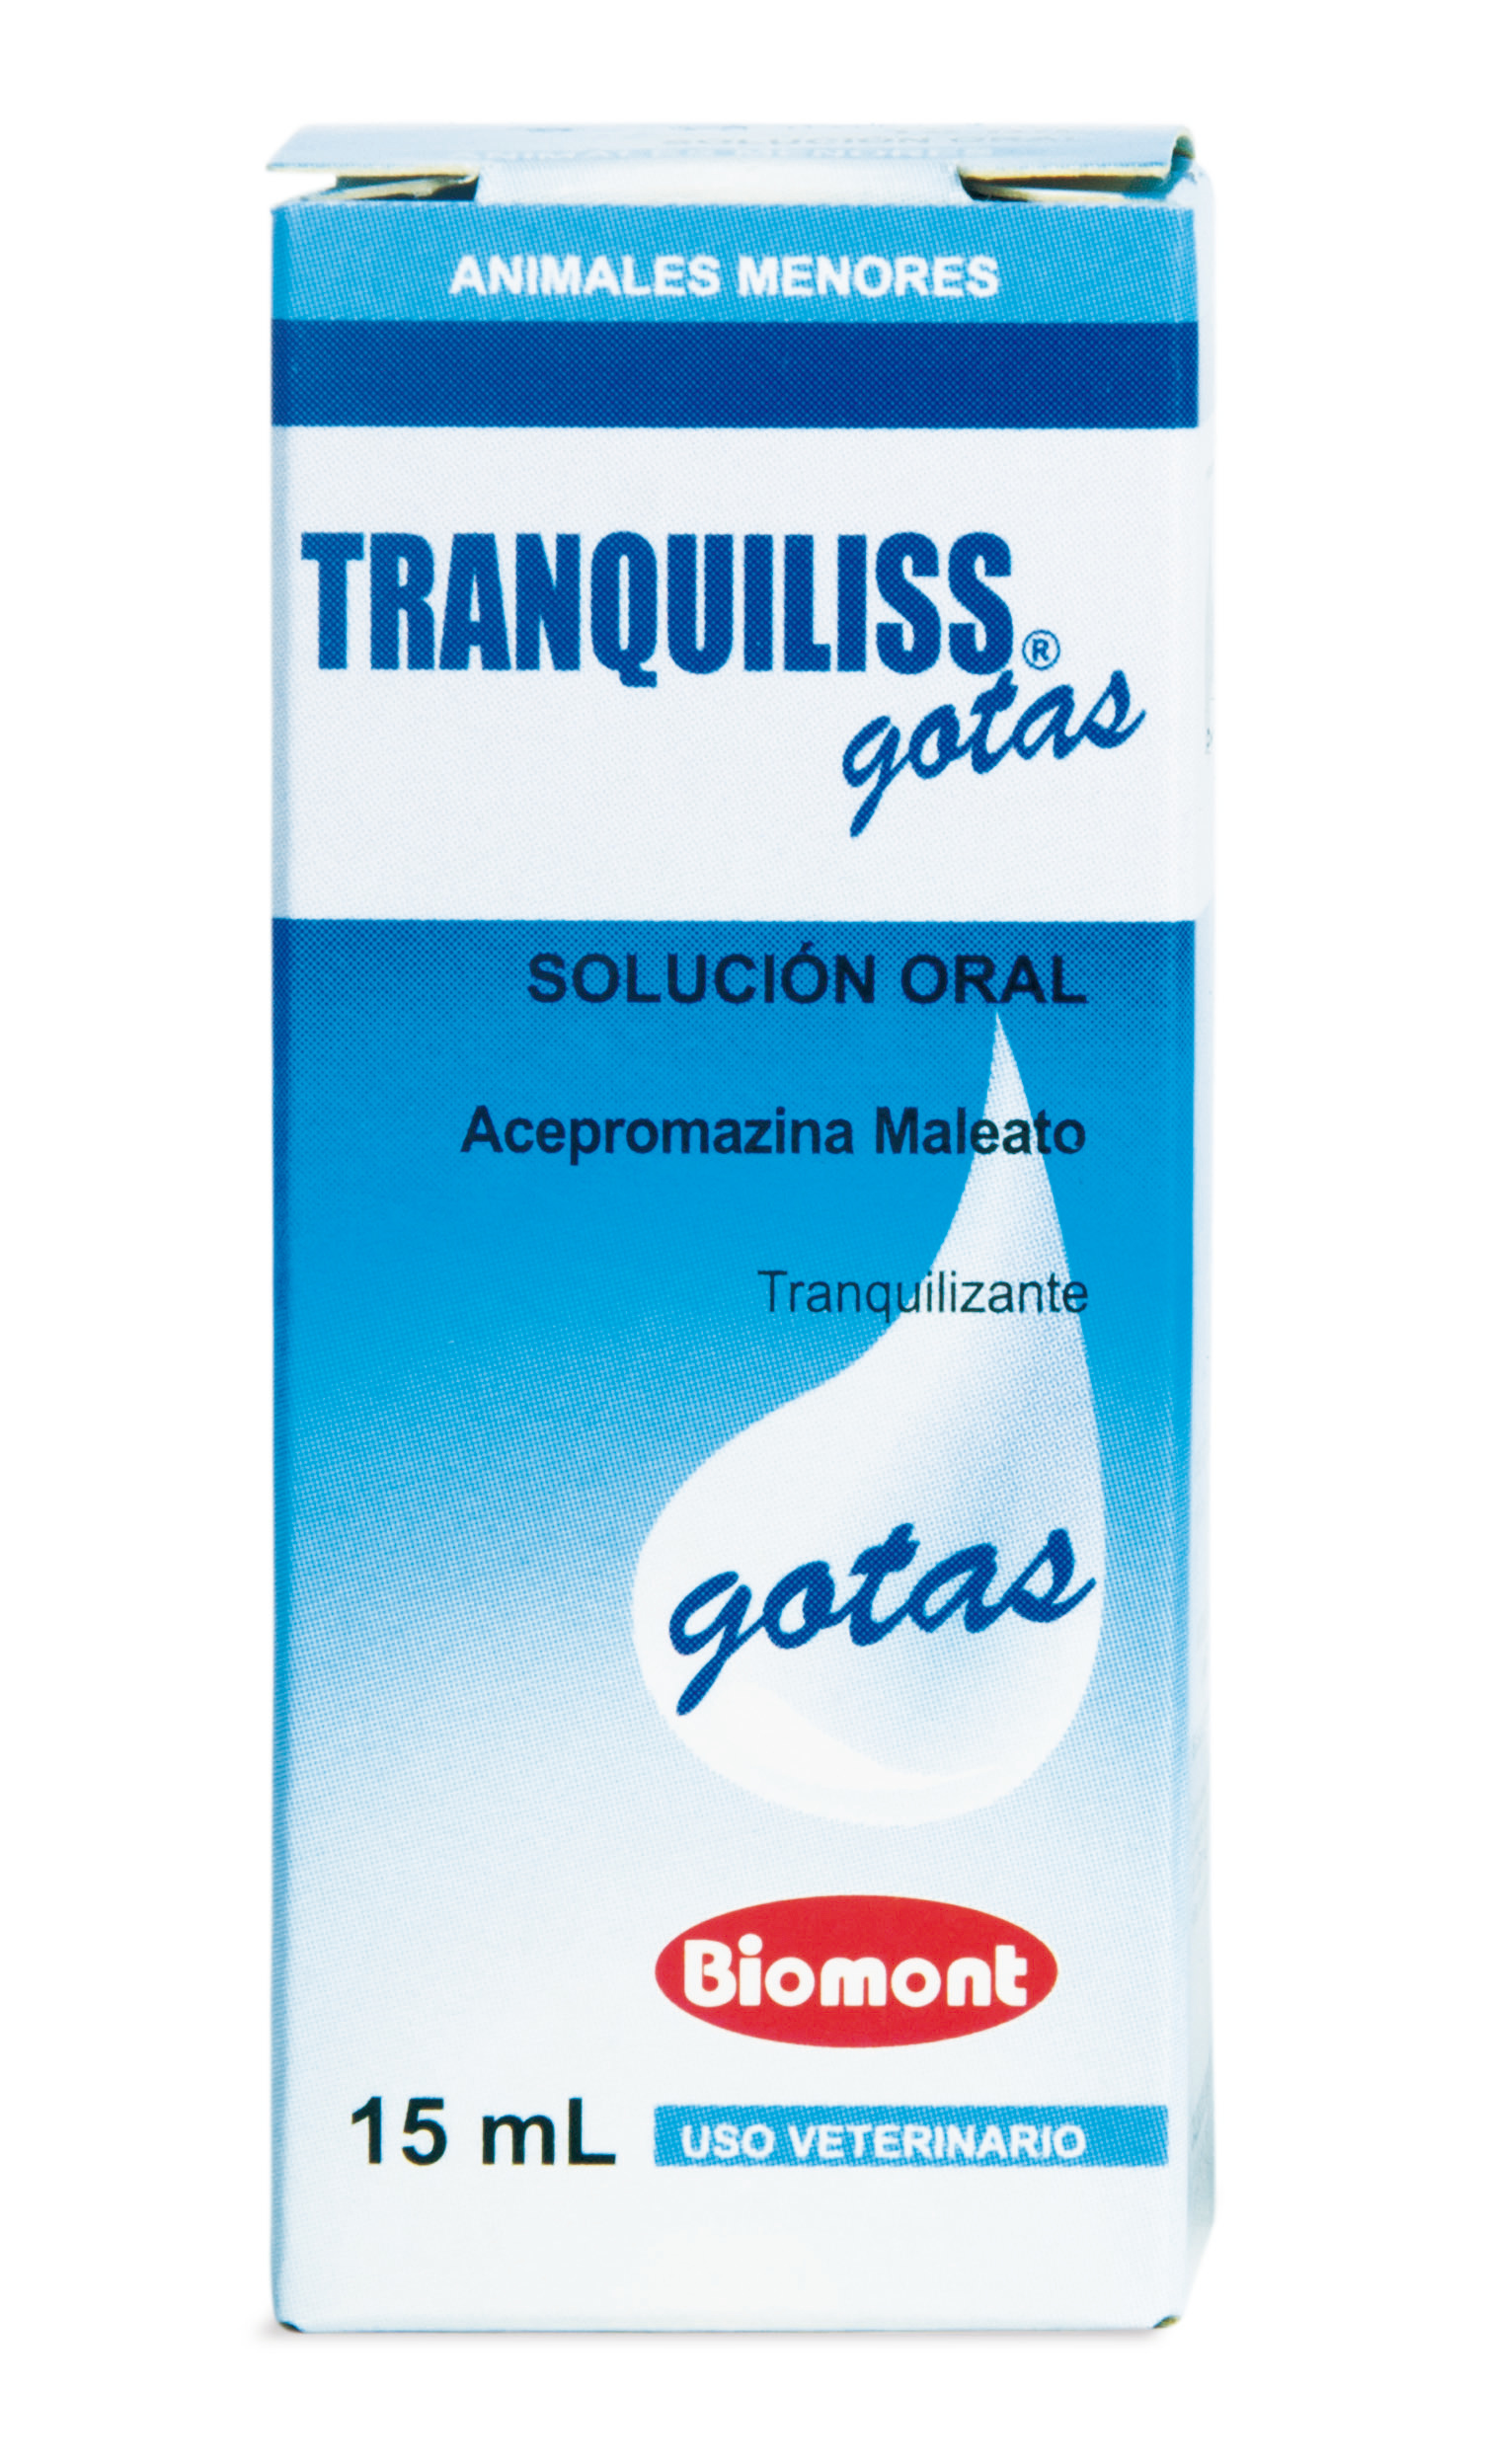 Tranquiliss Gotas_15mL